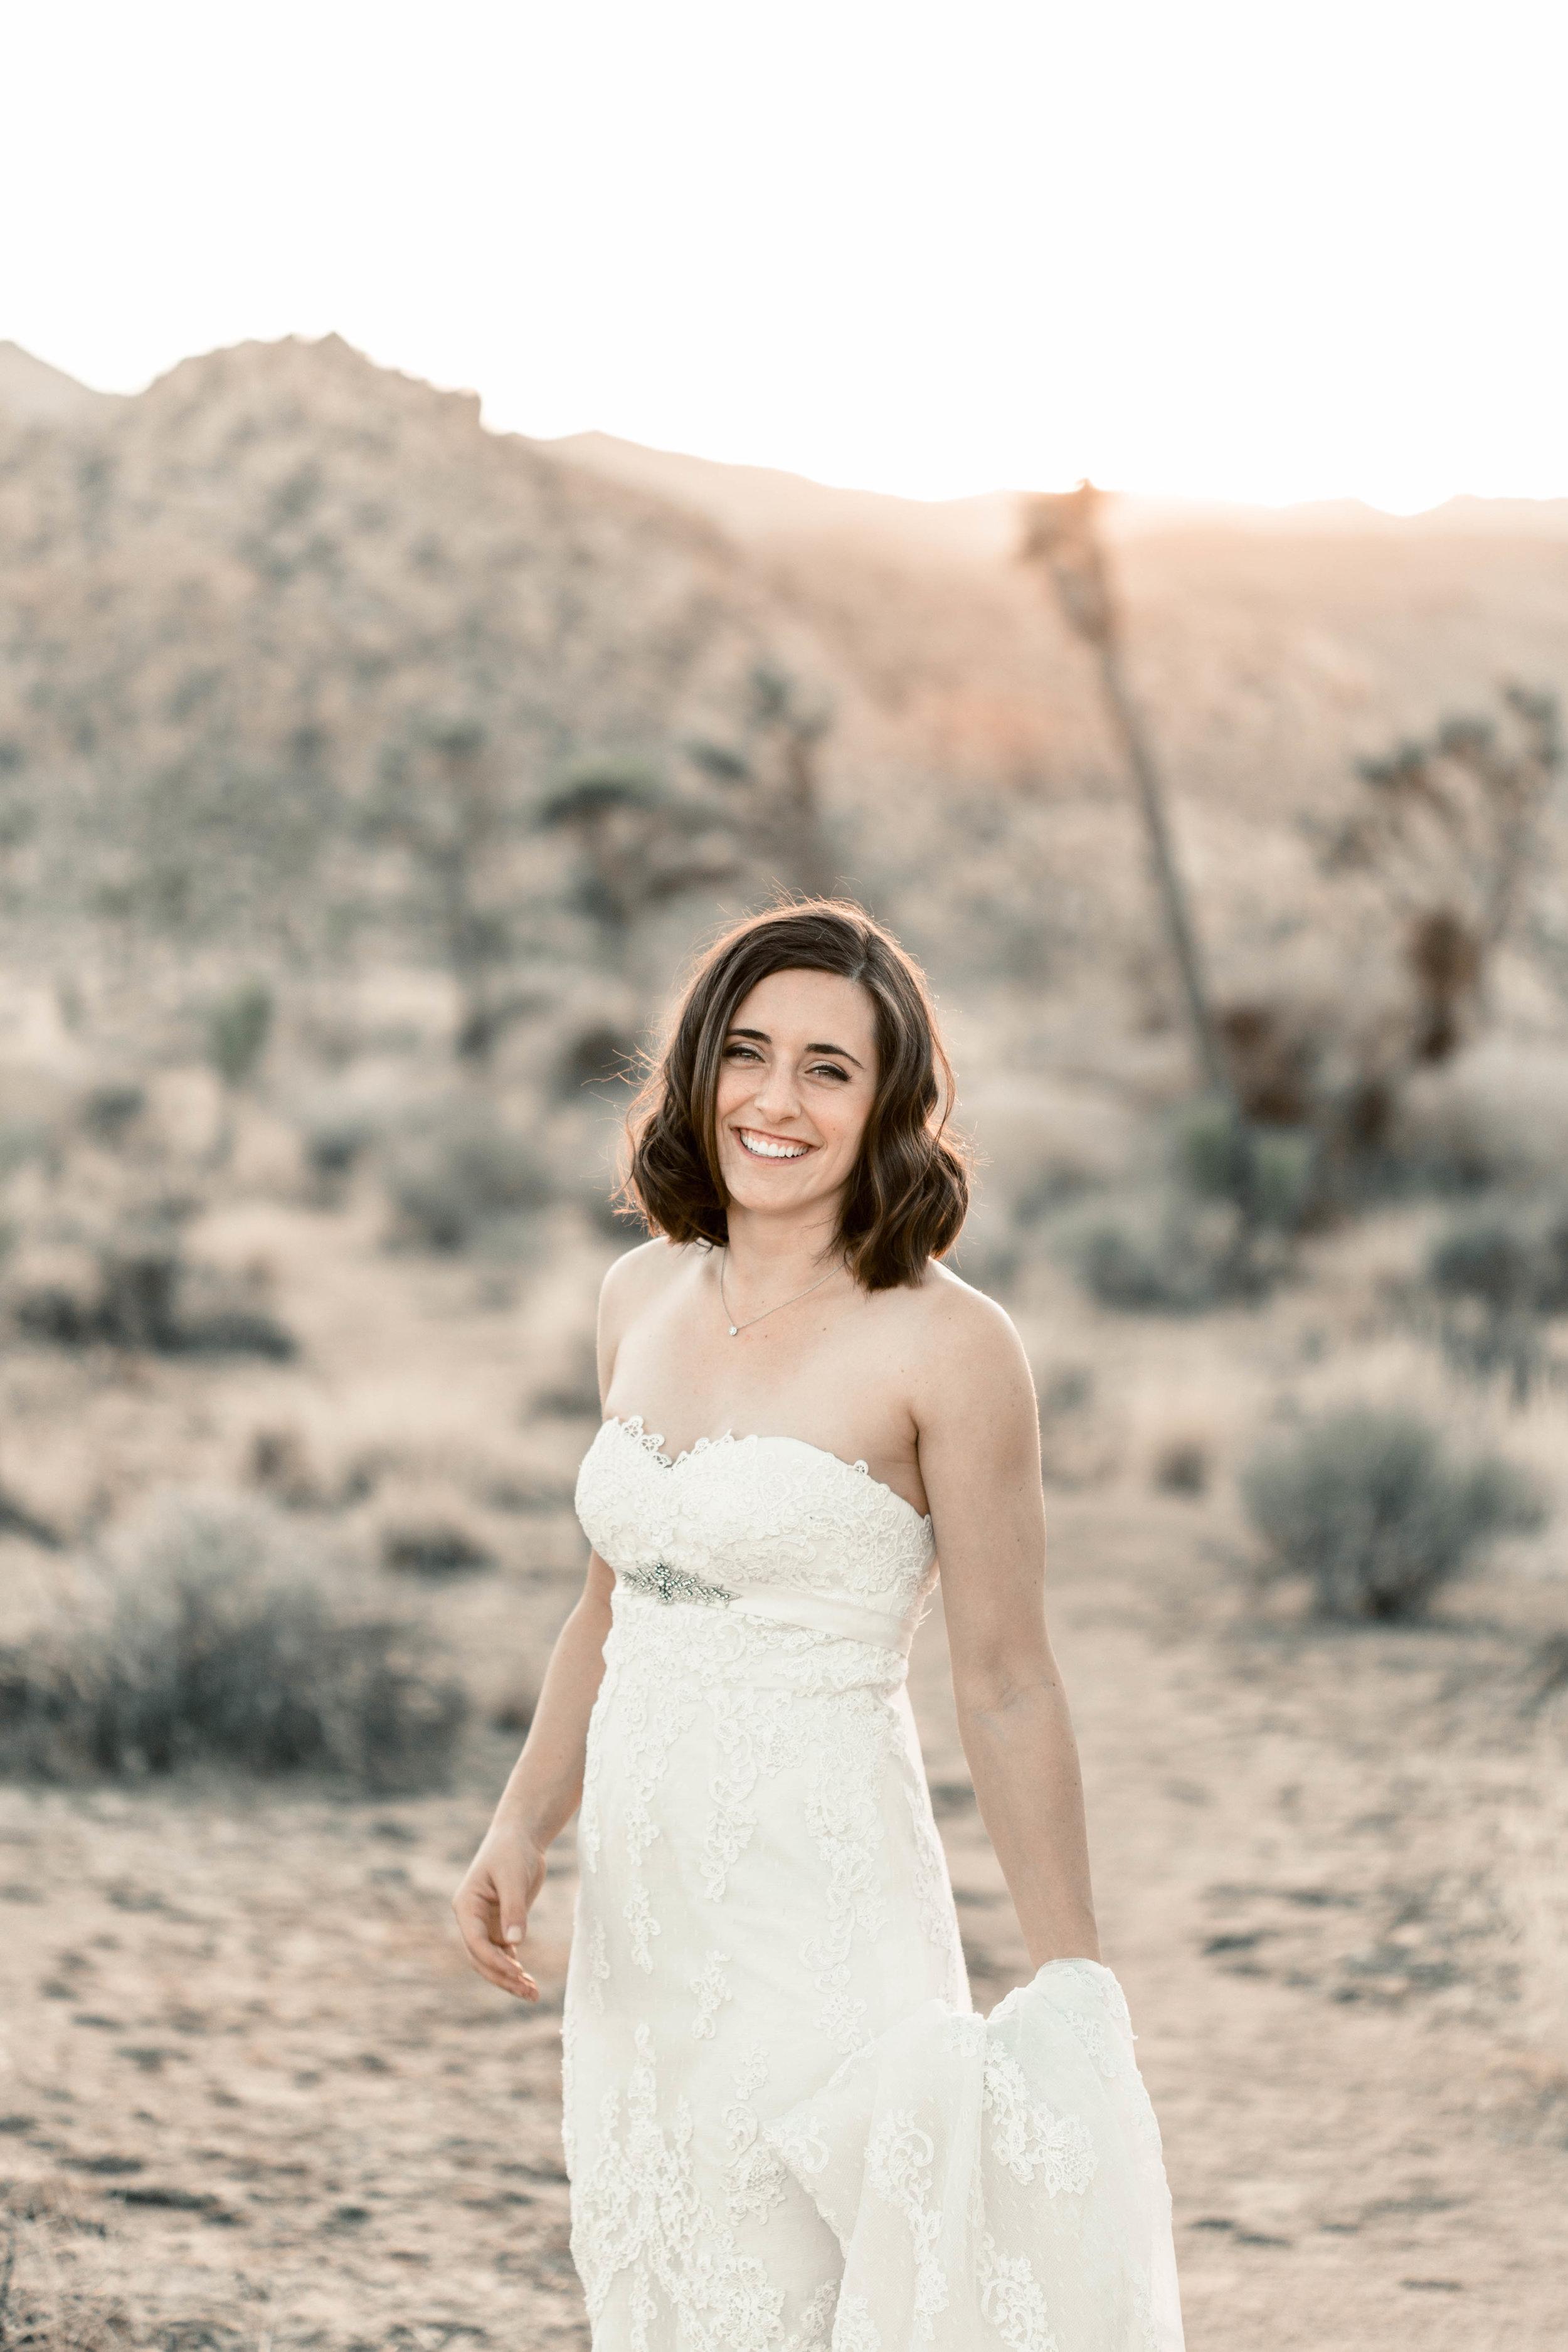 nicole-daacke-photography-joshua-tree-adventurous-elopement-wedding-national-park-wedding-photographer-adventure-wedding-adventurous-elopement-jtree-joshua-tree-national-park-wedding-photographer-intimate-weddings-golden-desert-love-30.jpg